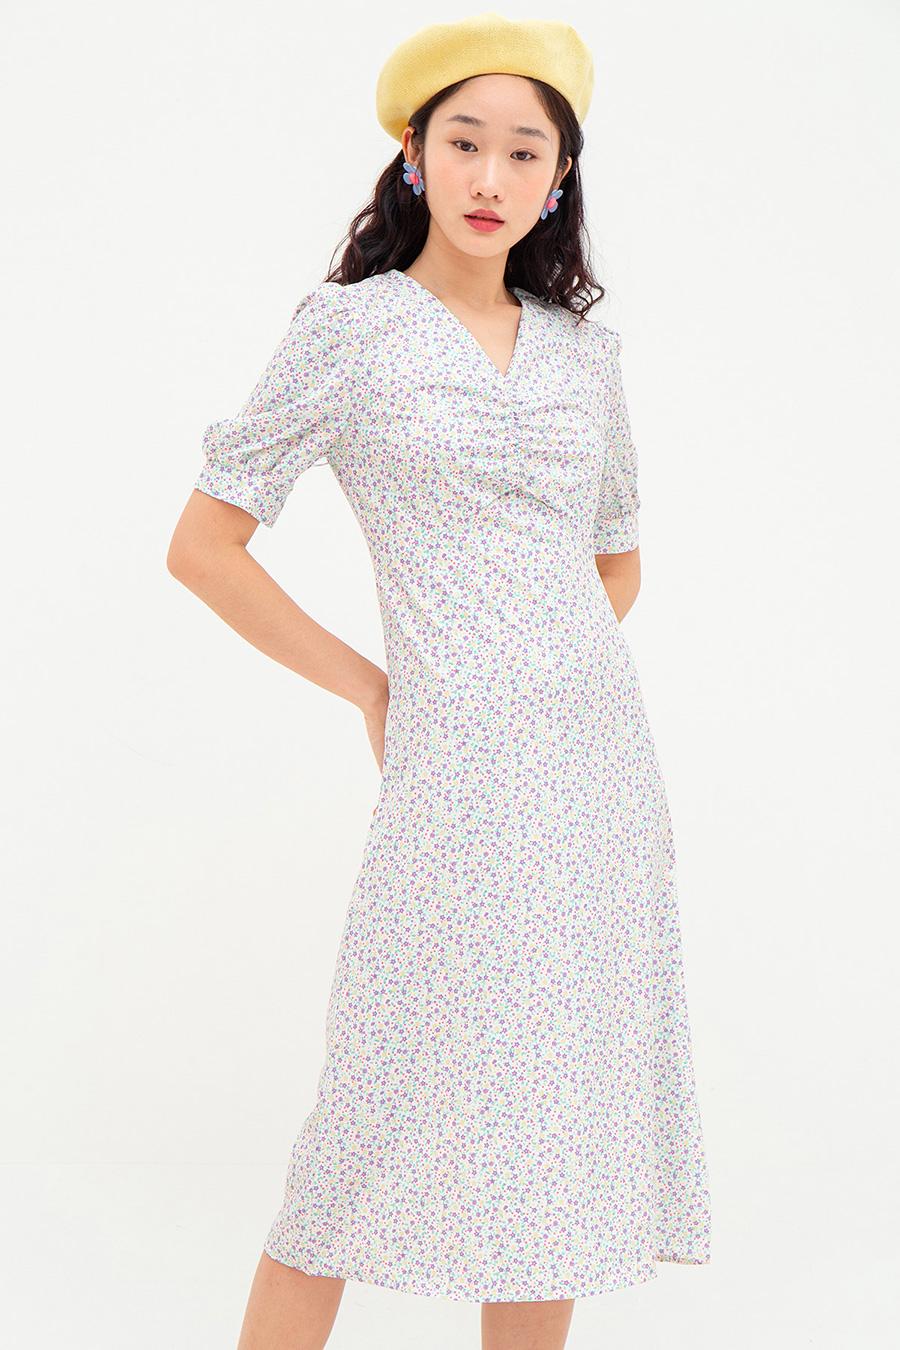 CHOQUET DRESS - HYACINTH